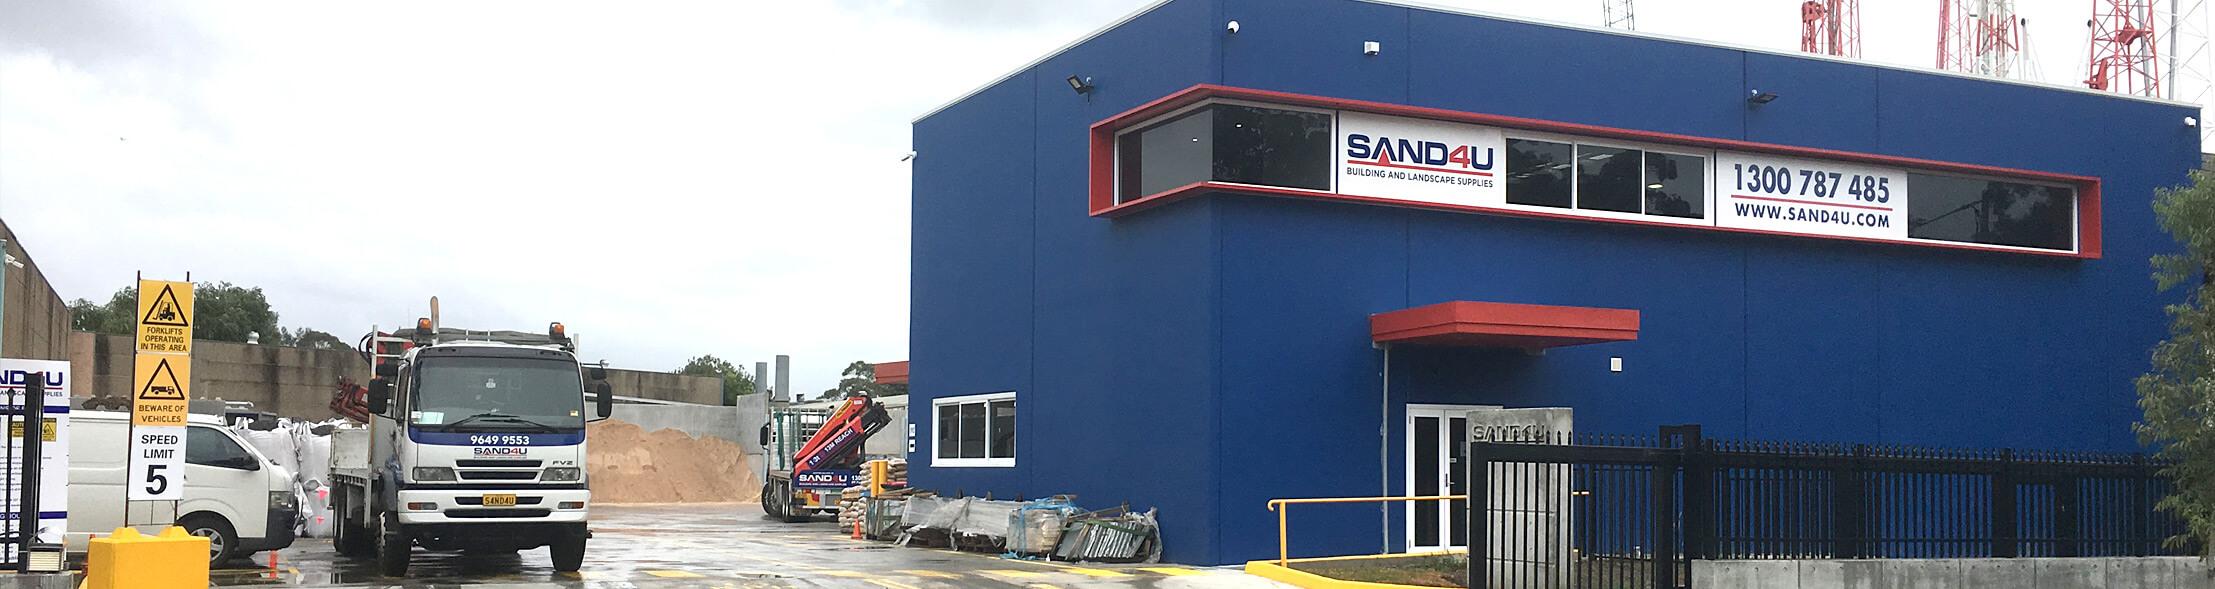 sand4u-banner-2